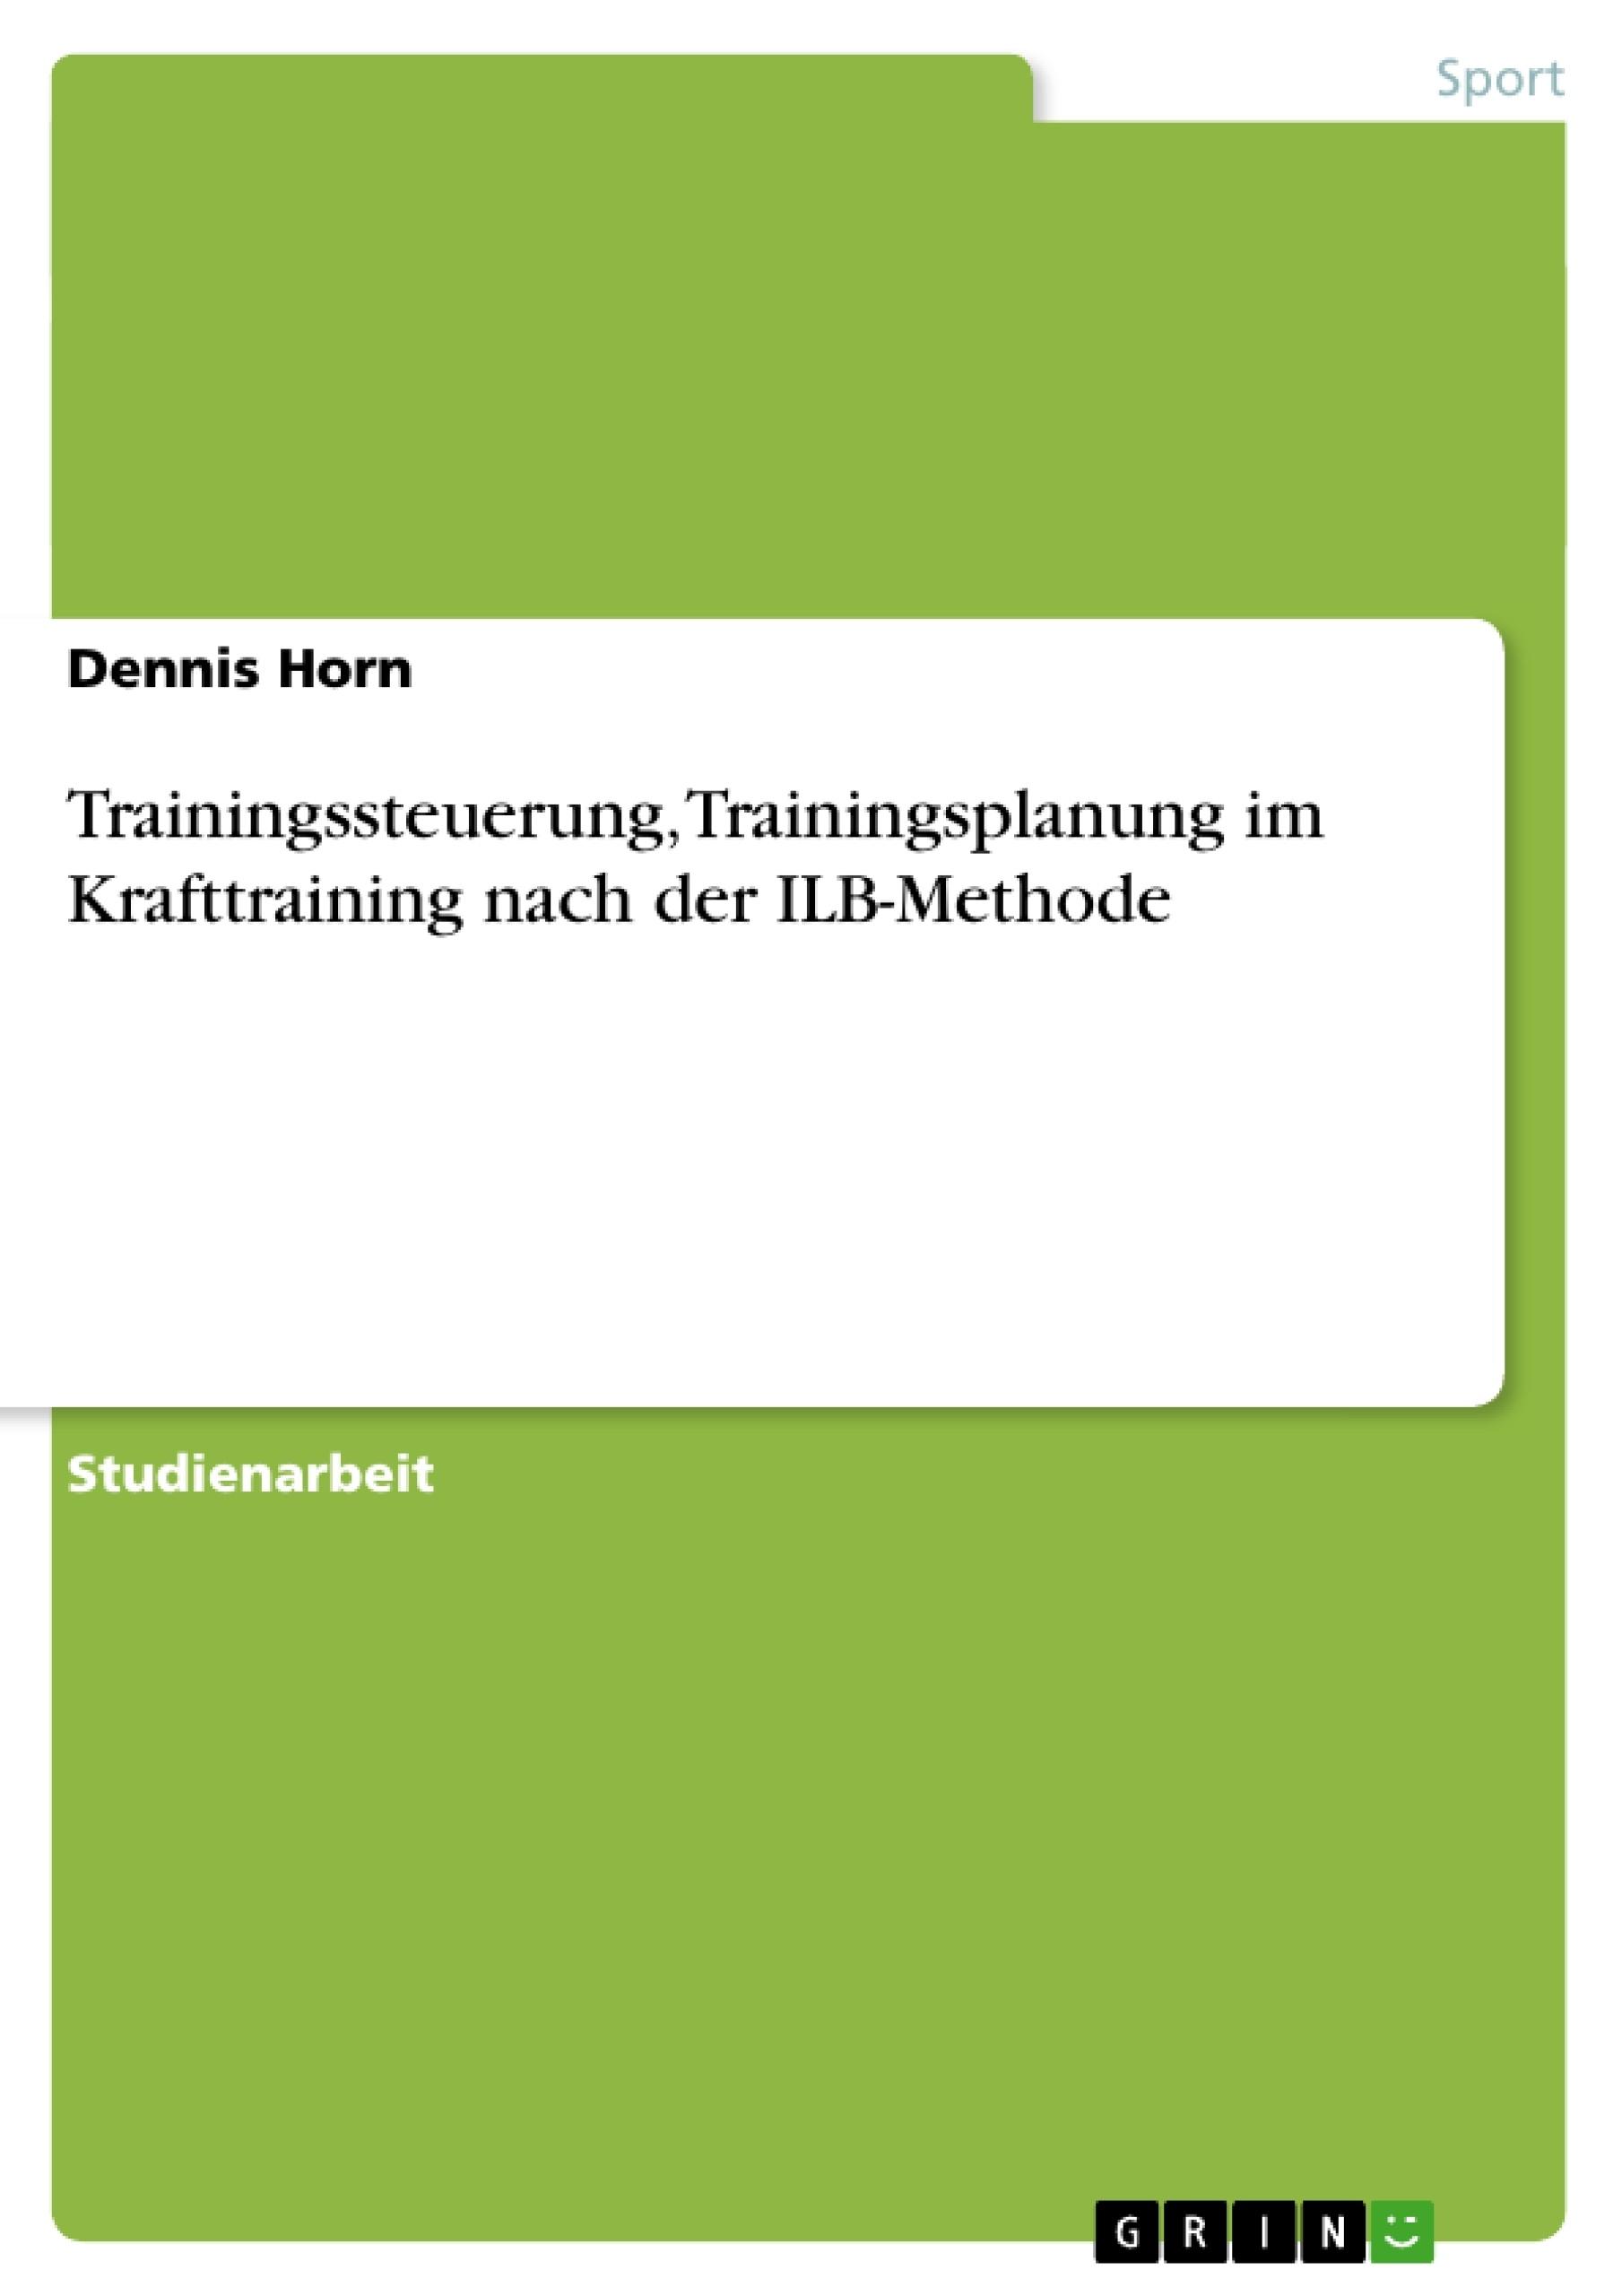 Titel: Trainingssteuerung, Trainingsplanung im Krafttraining nach der ILB-Methode